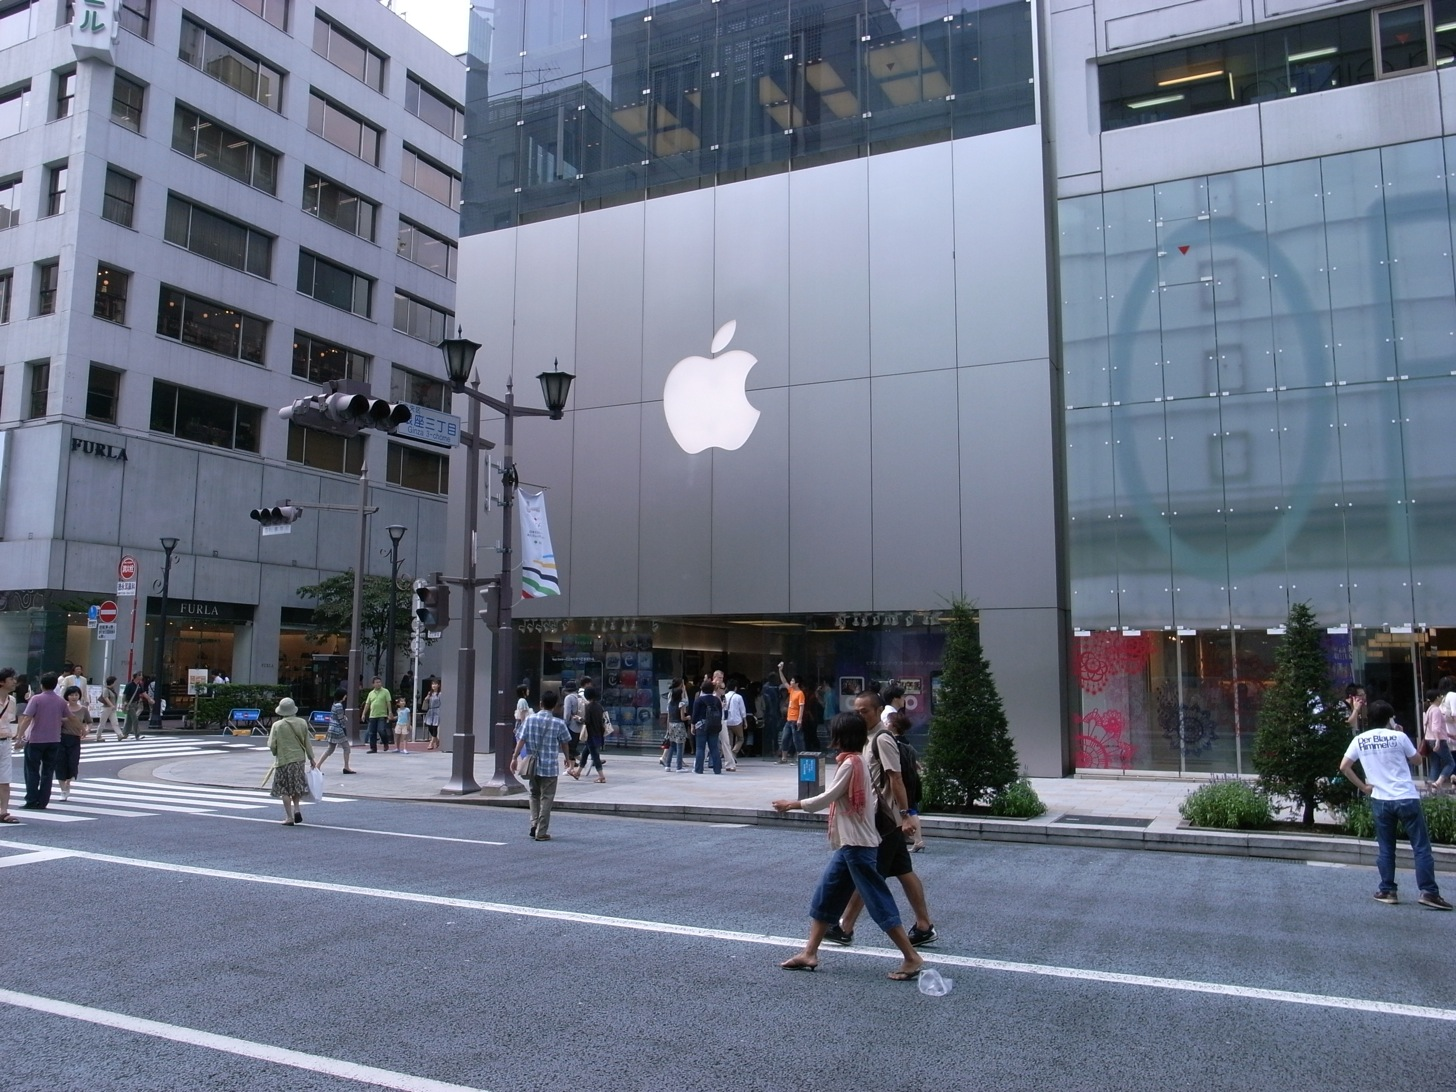 Apple store ginza gyouretu mou nai